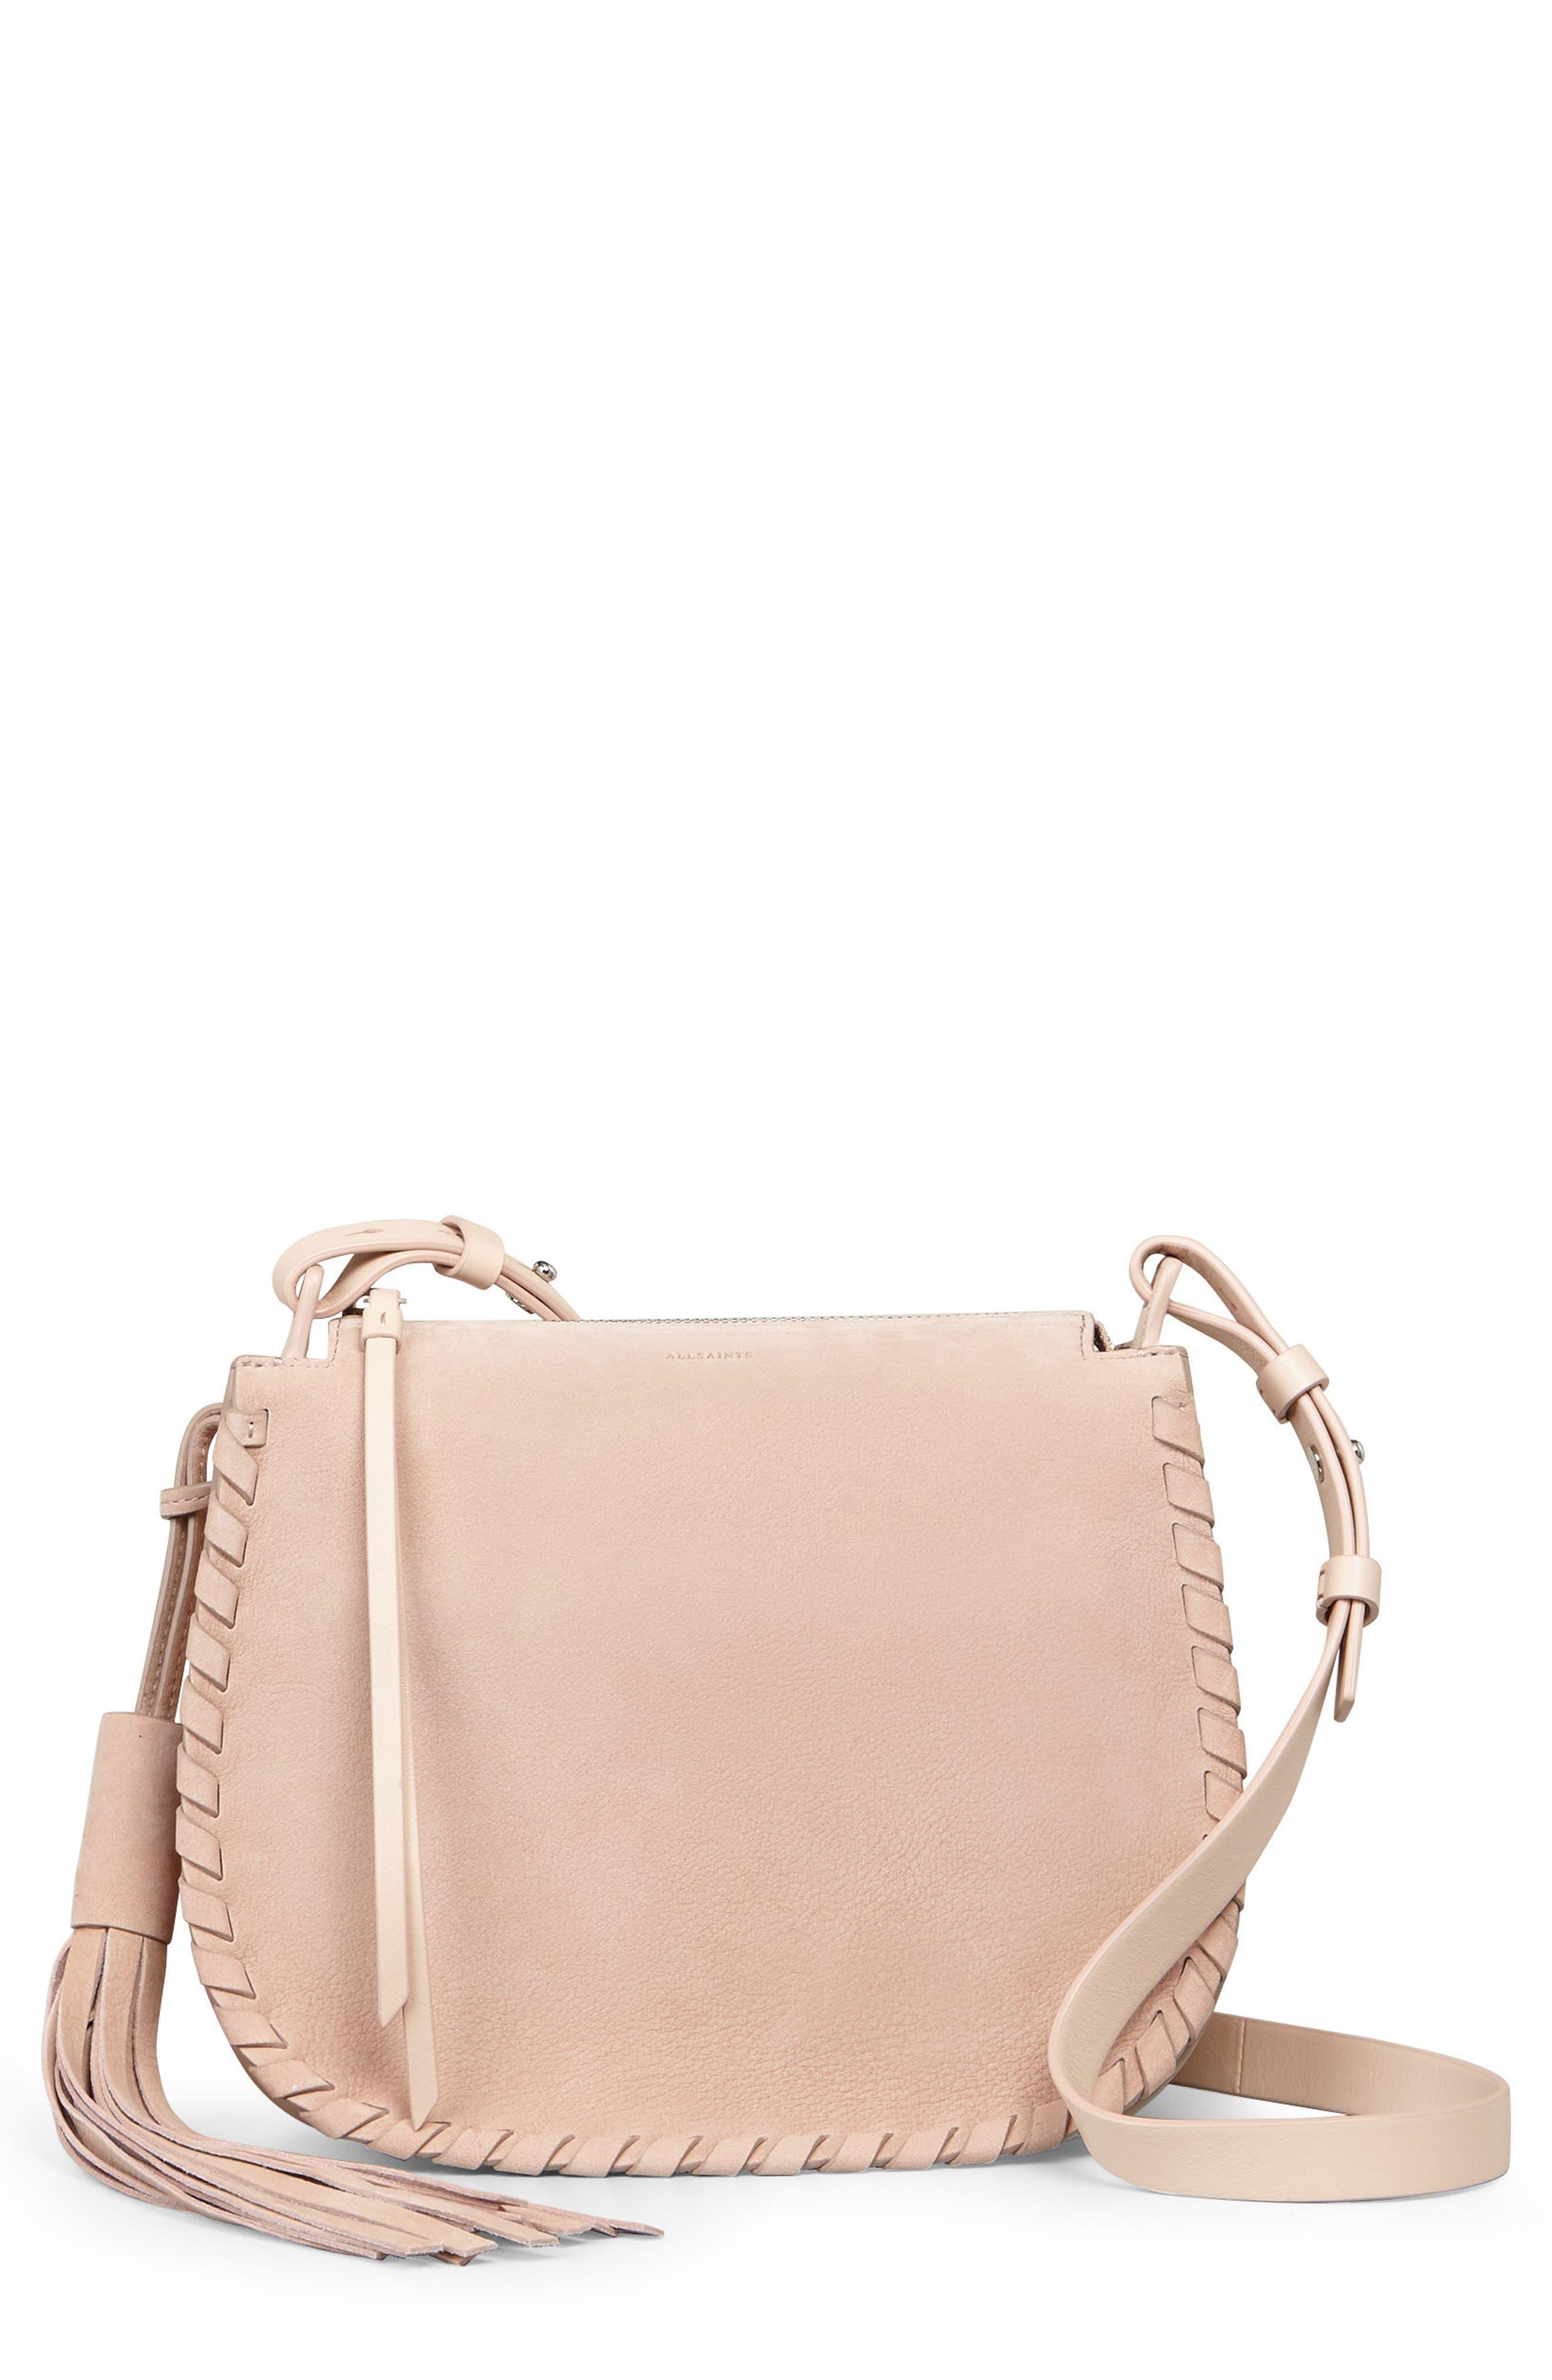 Mori Suede Crossbody Bag,                             Main thumbnail 1, color,                             Nude Pink